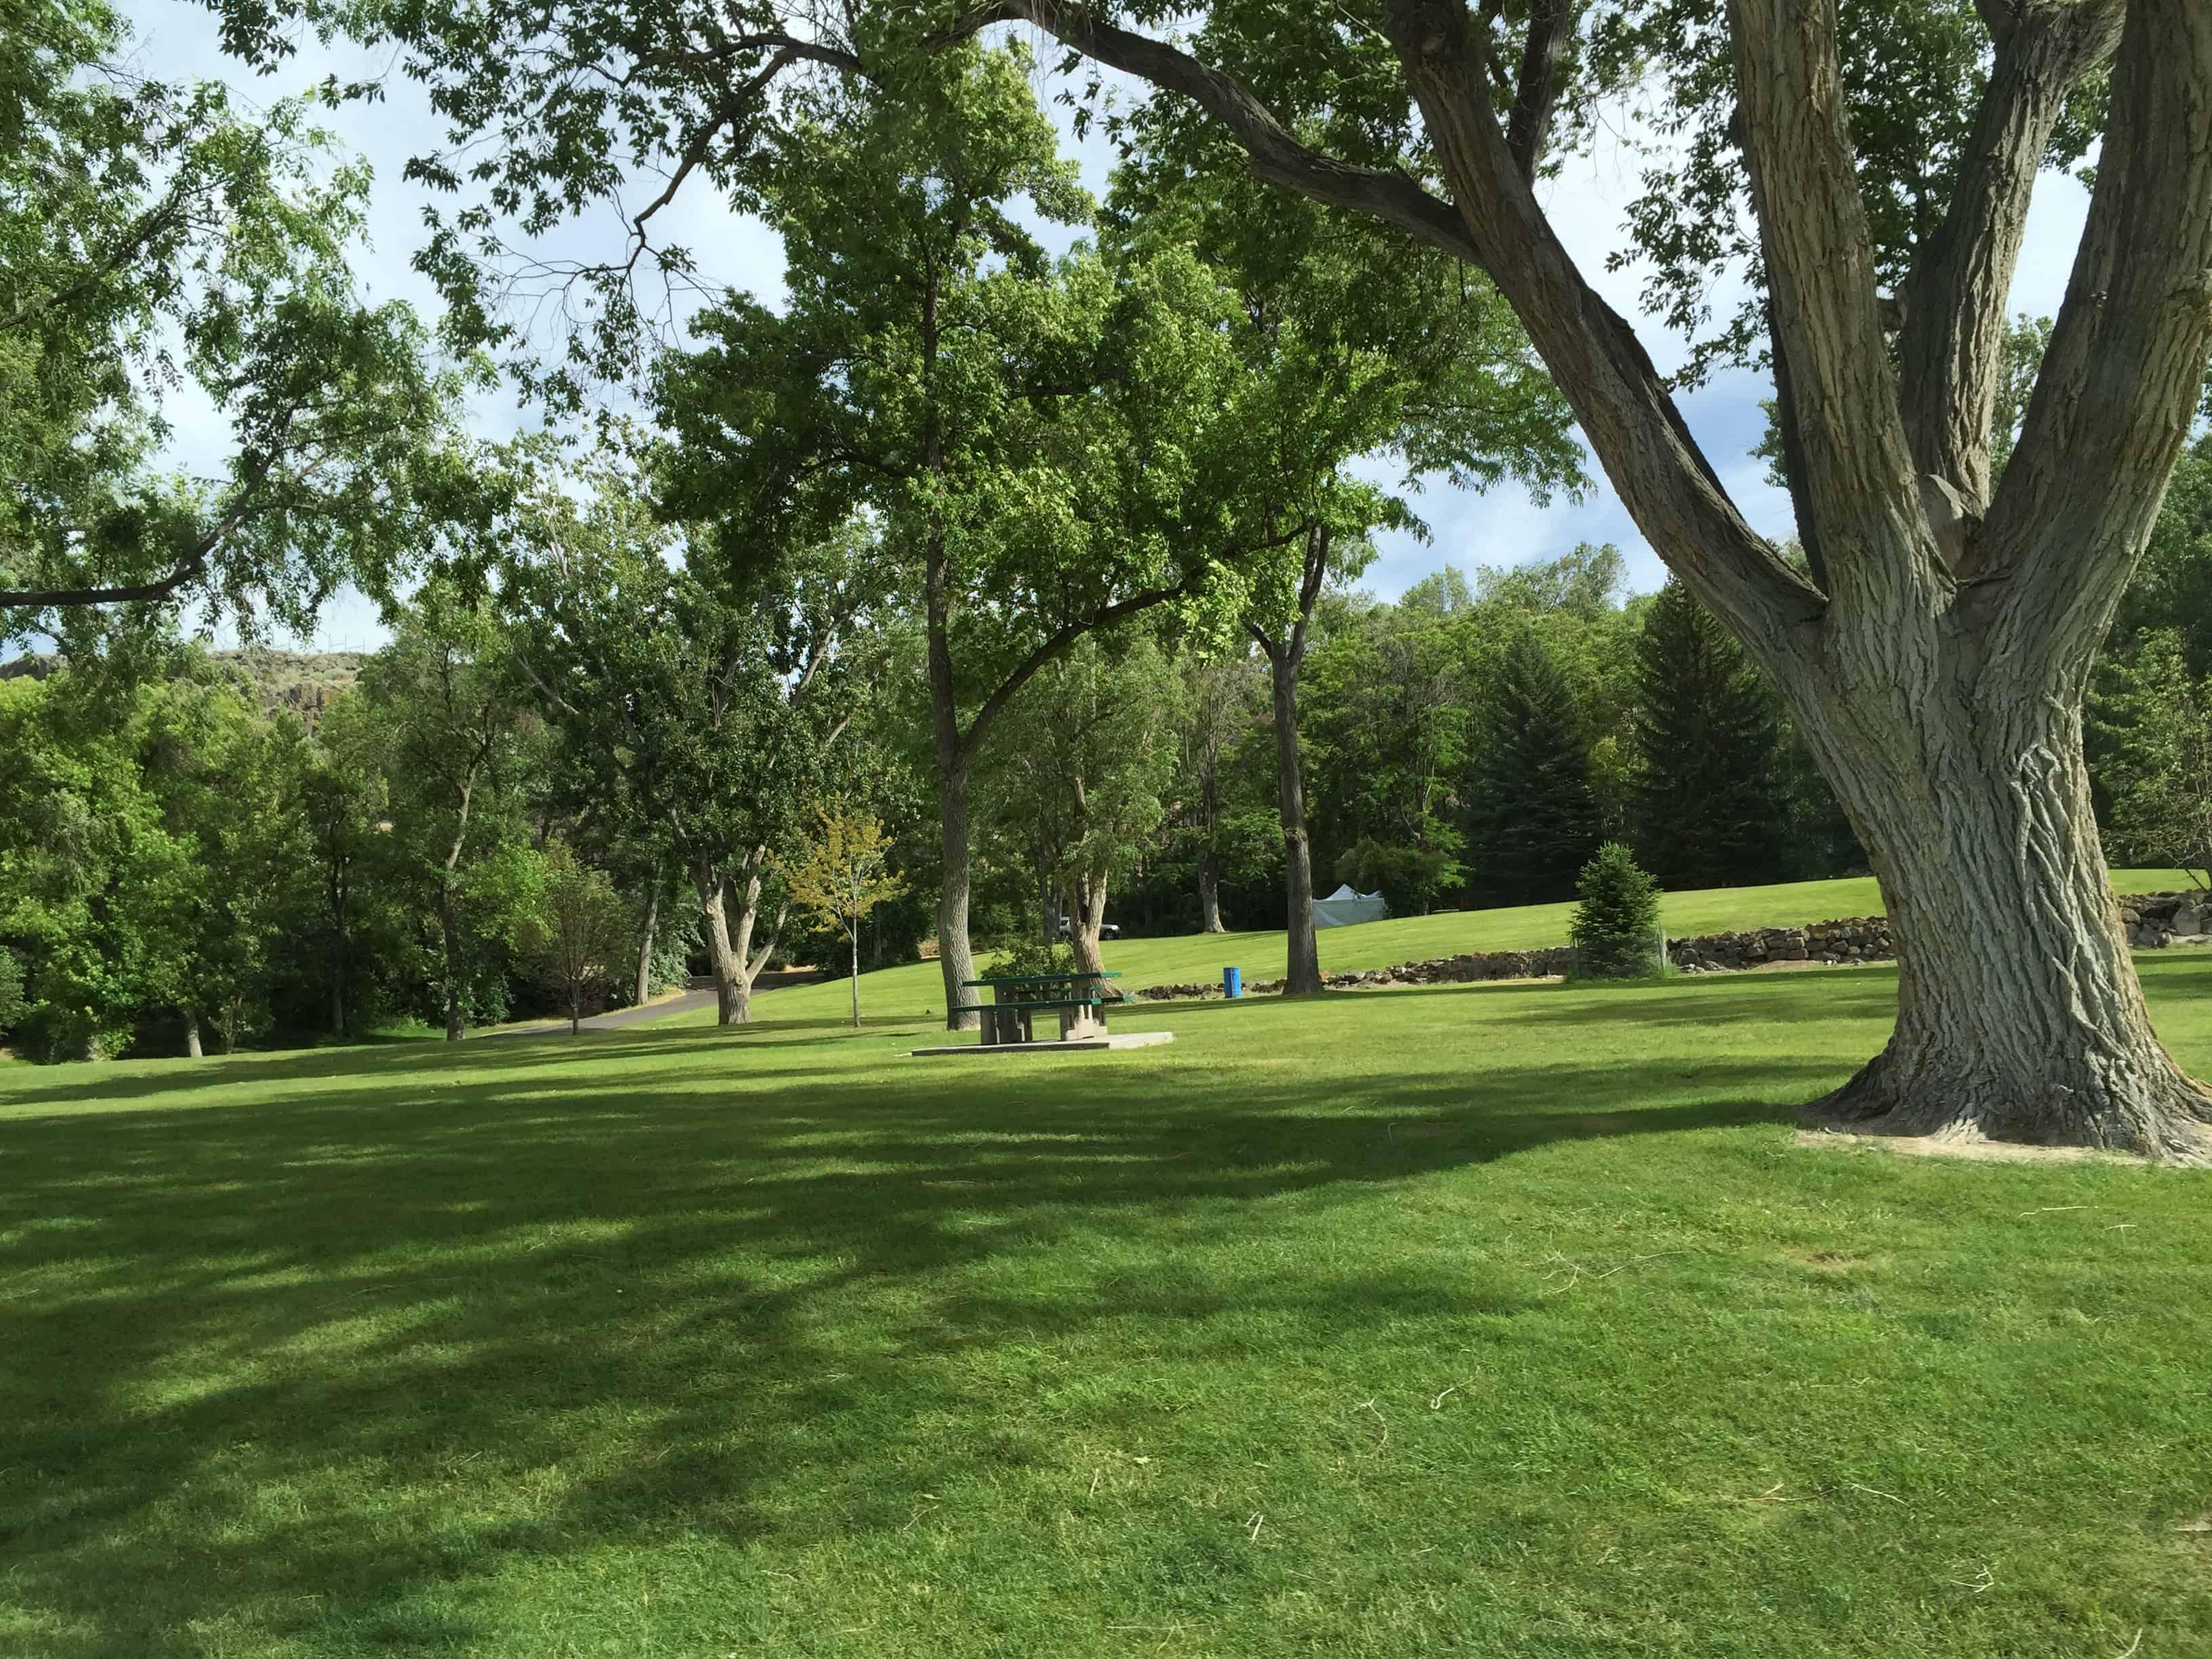 shoshone_falls_picnic